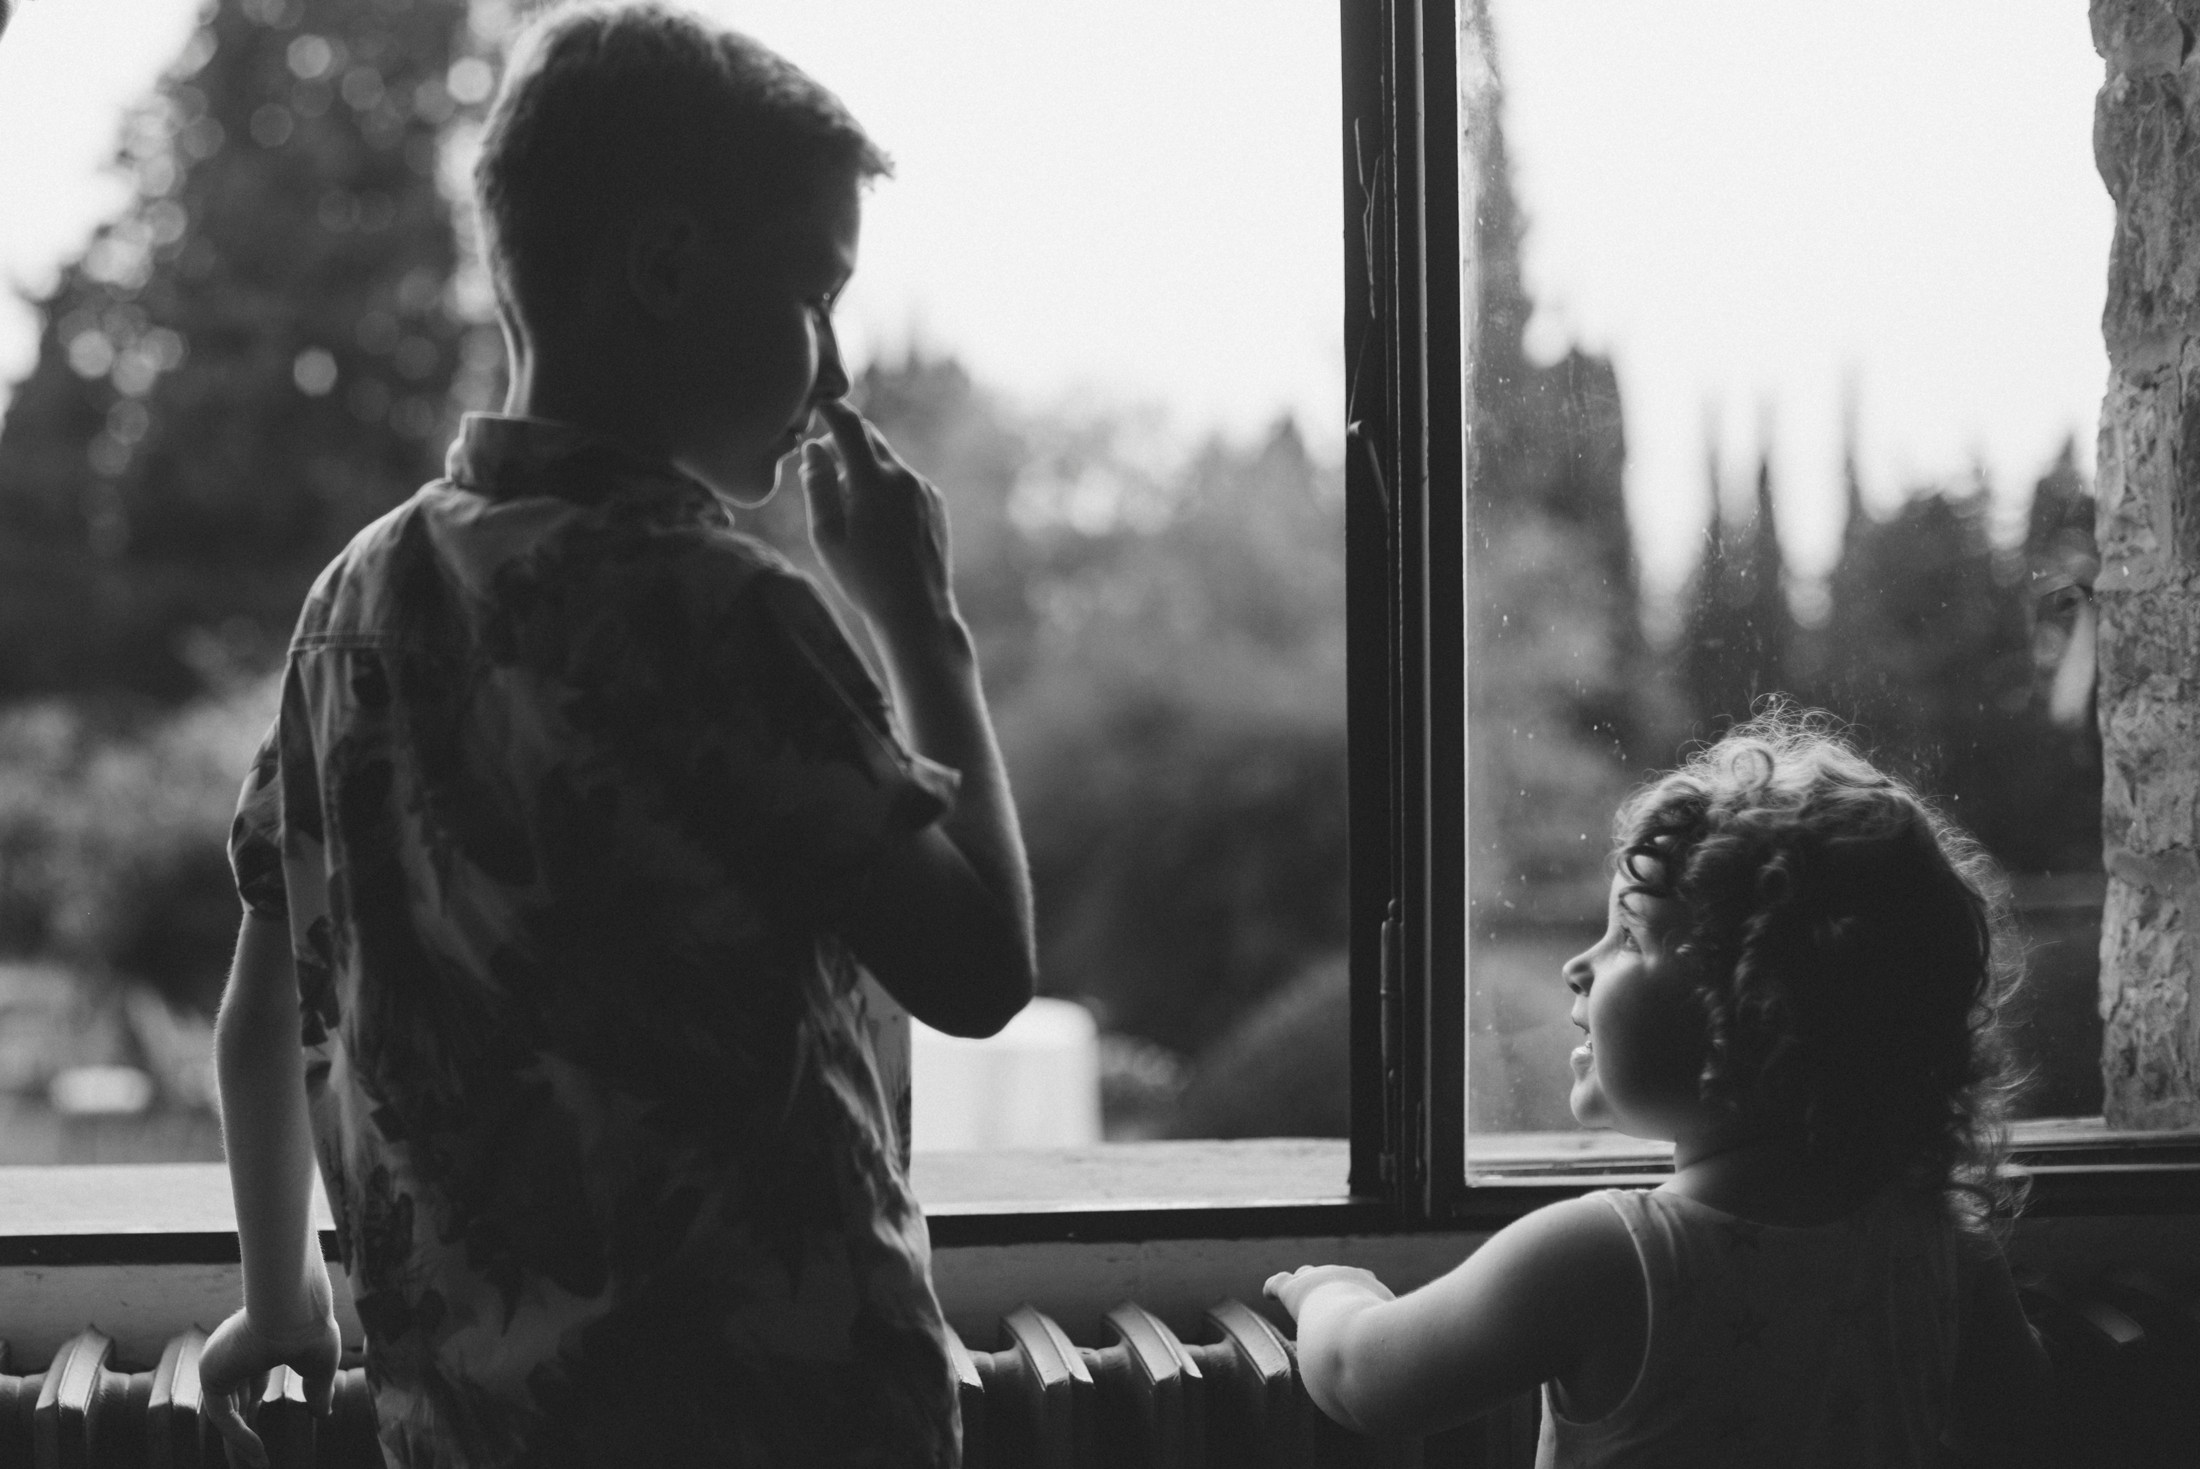 children talking at the window